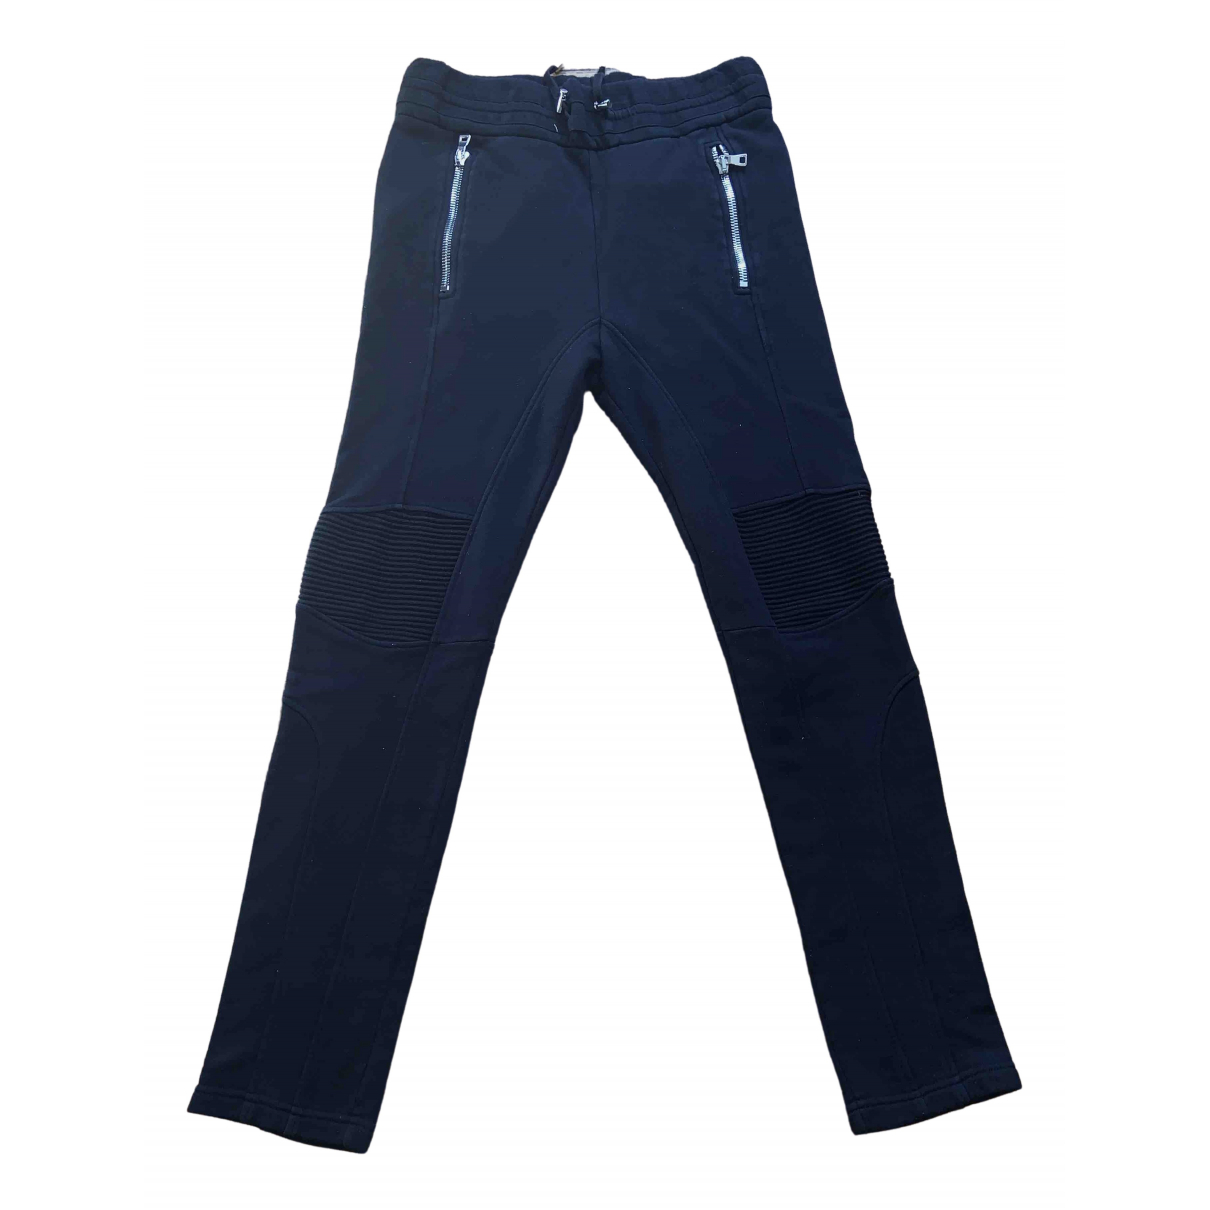 Balmain \N Black Cotton Trousers for Men M International